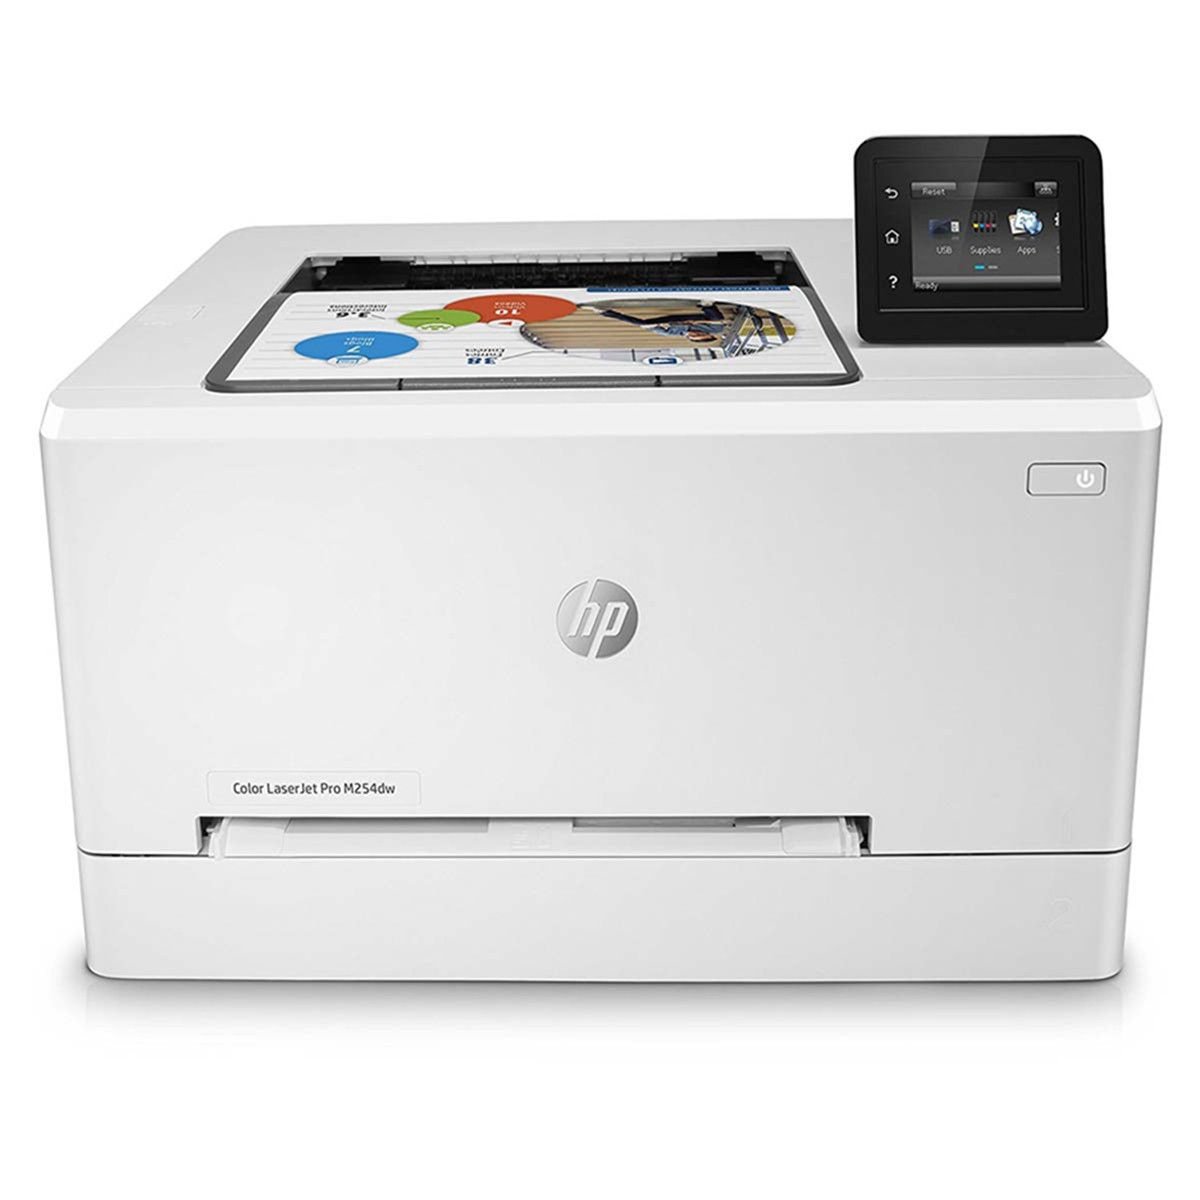 Impressora HP LaserJet M254DW T6B60A | Colorida Com Impressão Duplex e Wireless